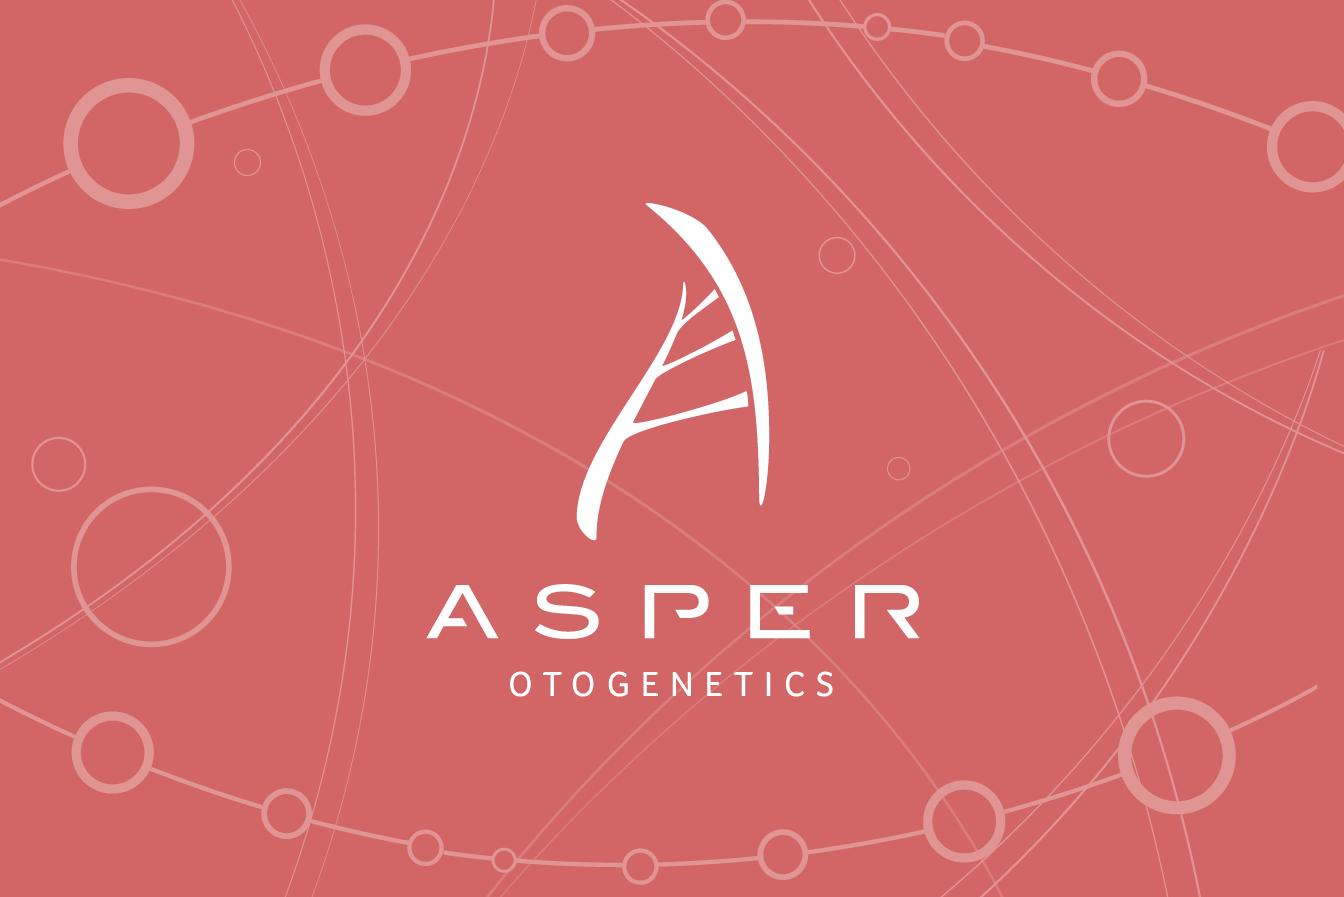 Asper Otogenetics News